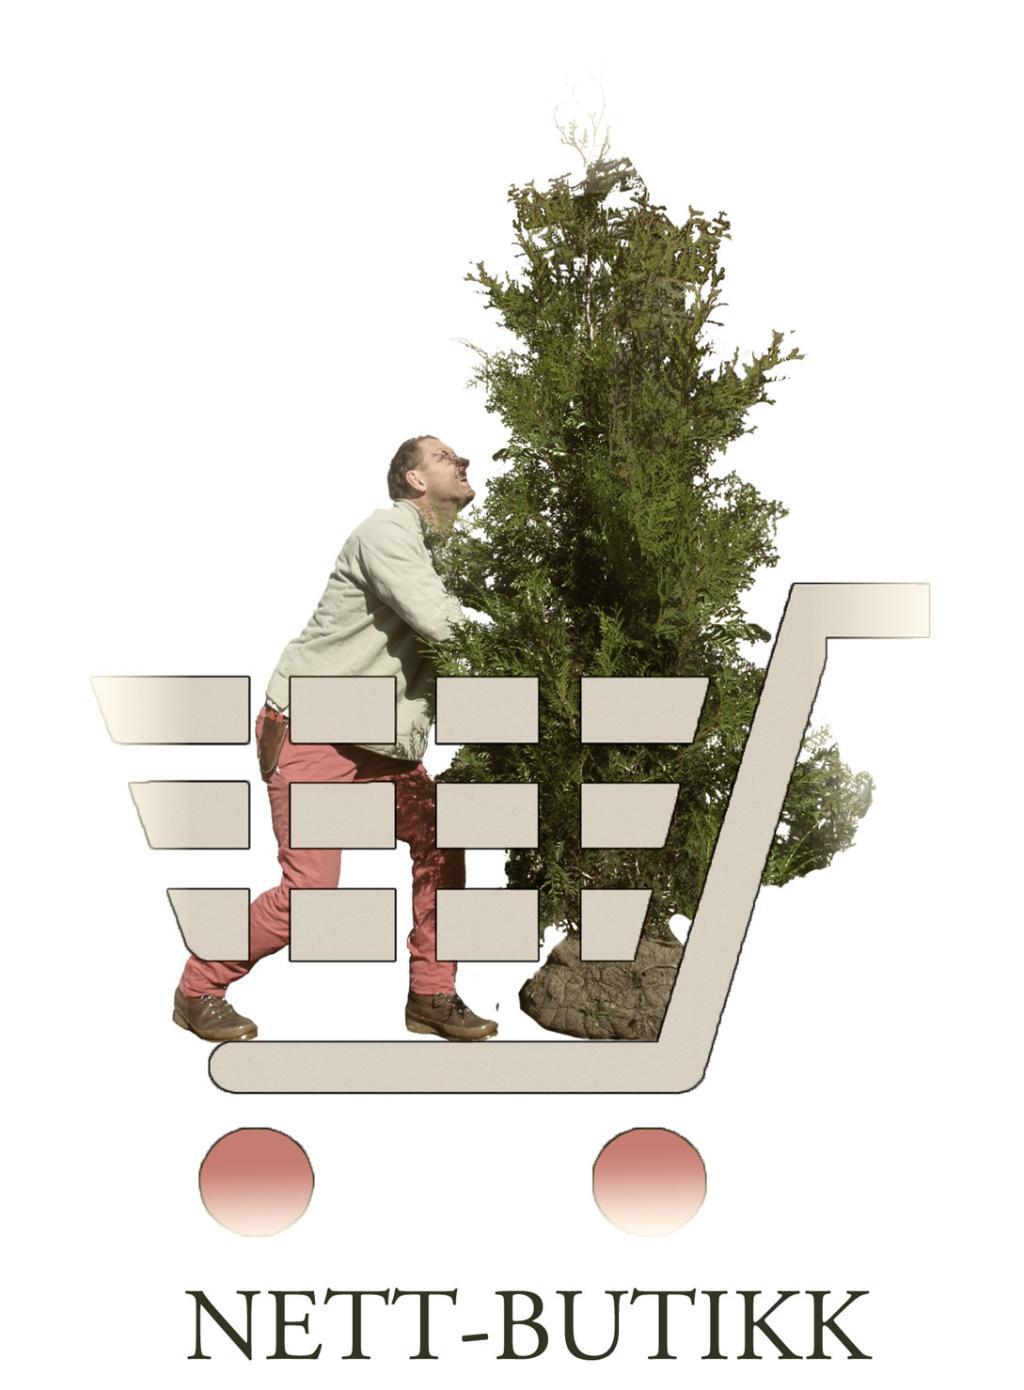 Randesund planteskole nettbutikk